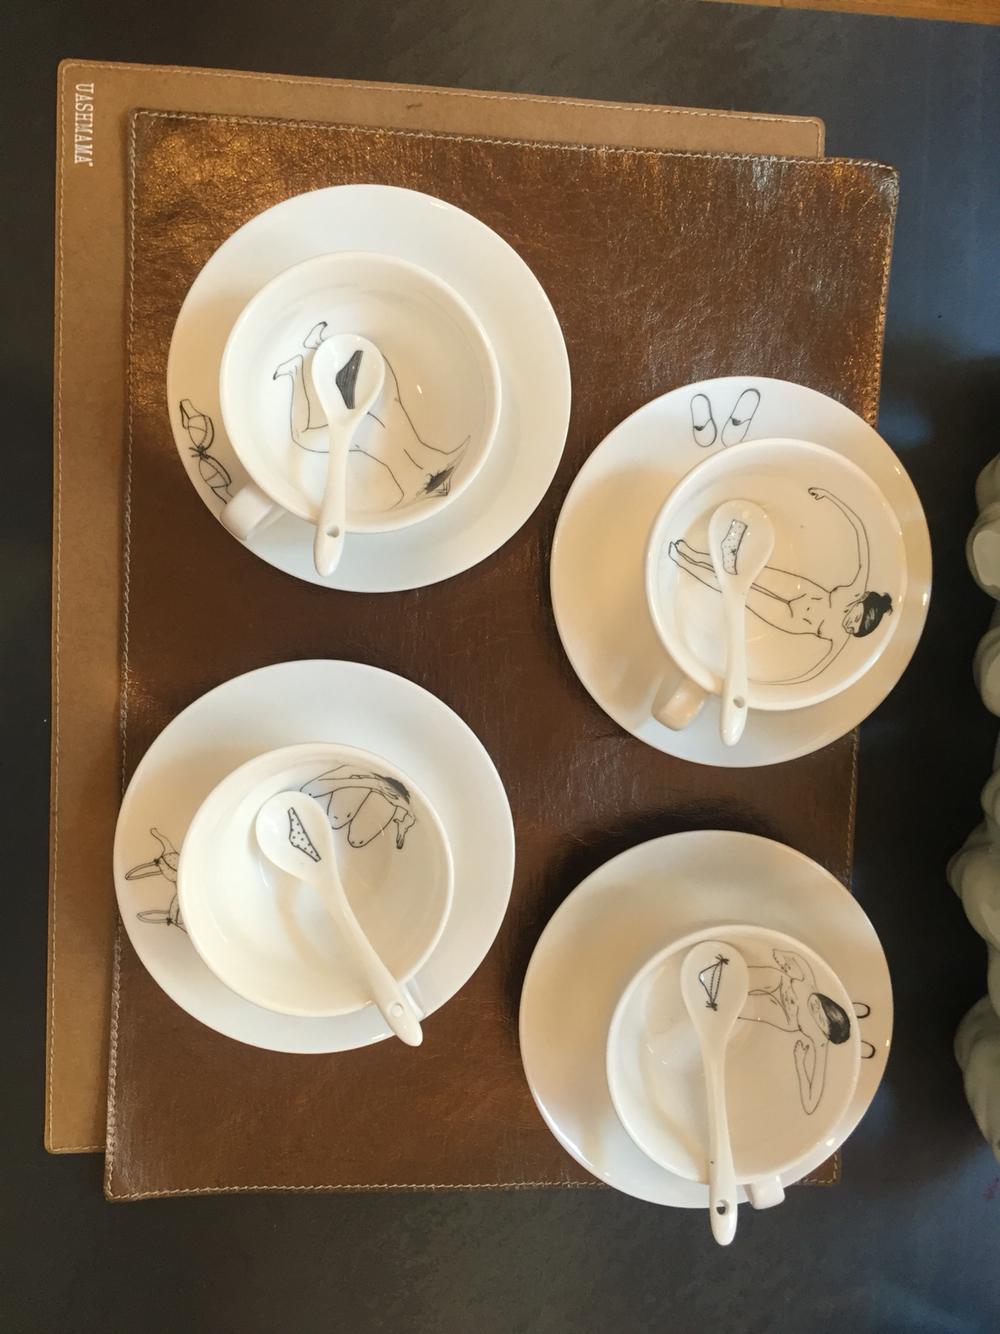 funny bowls